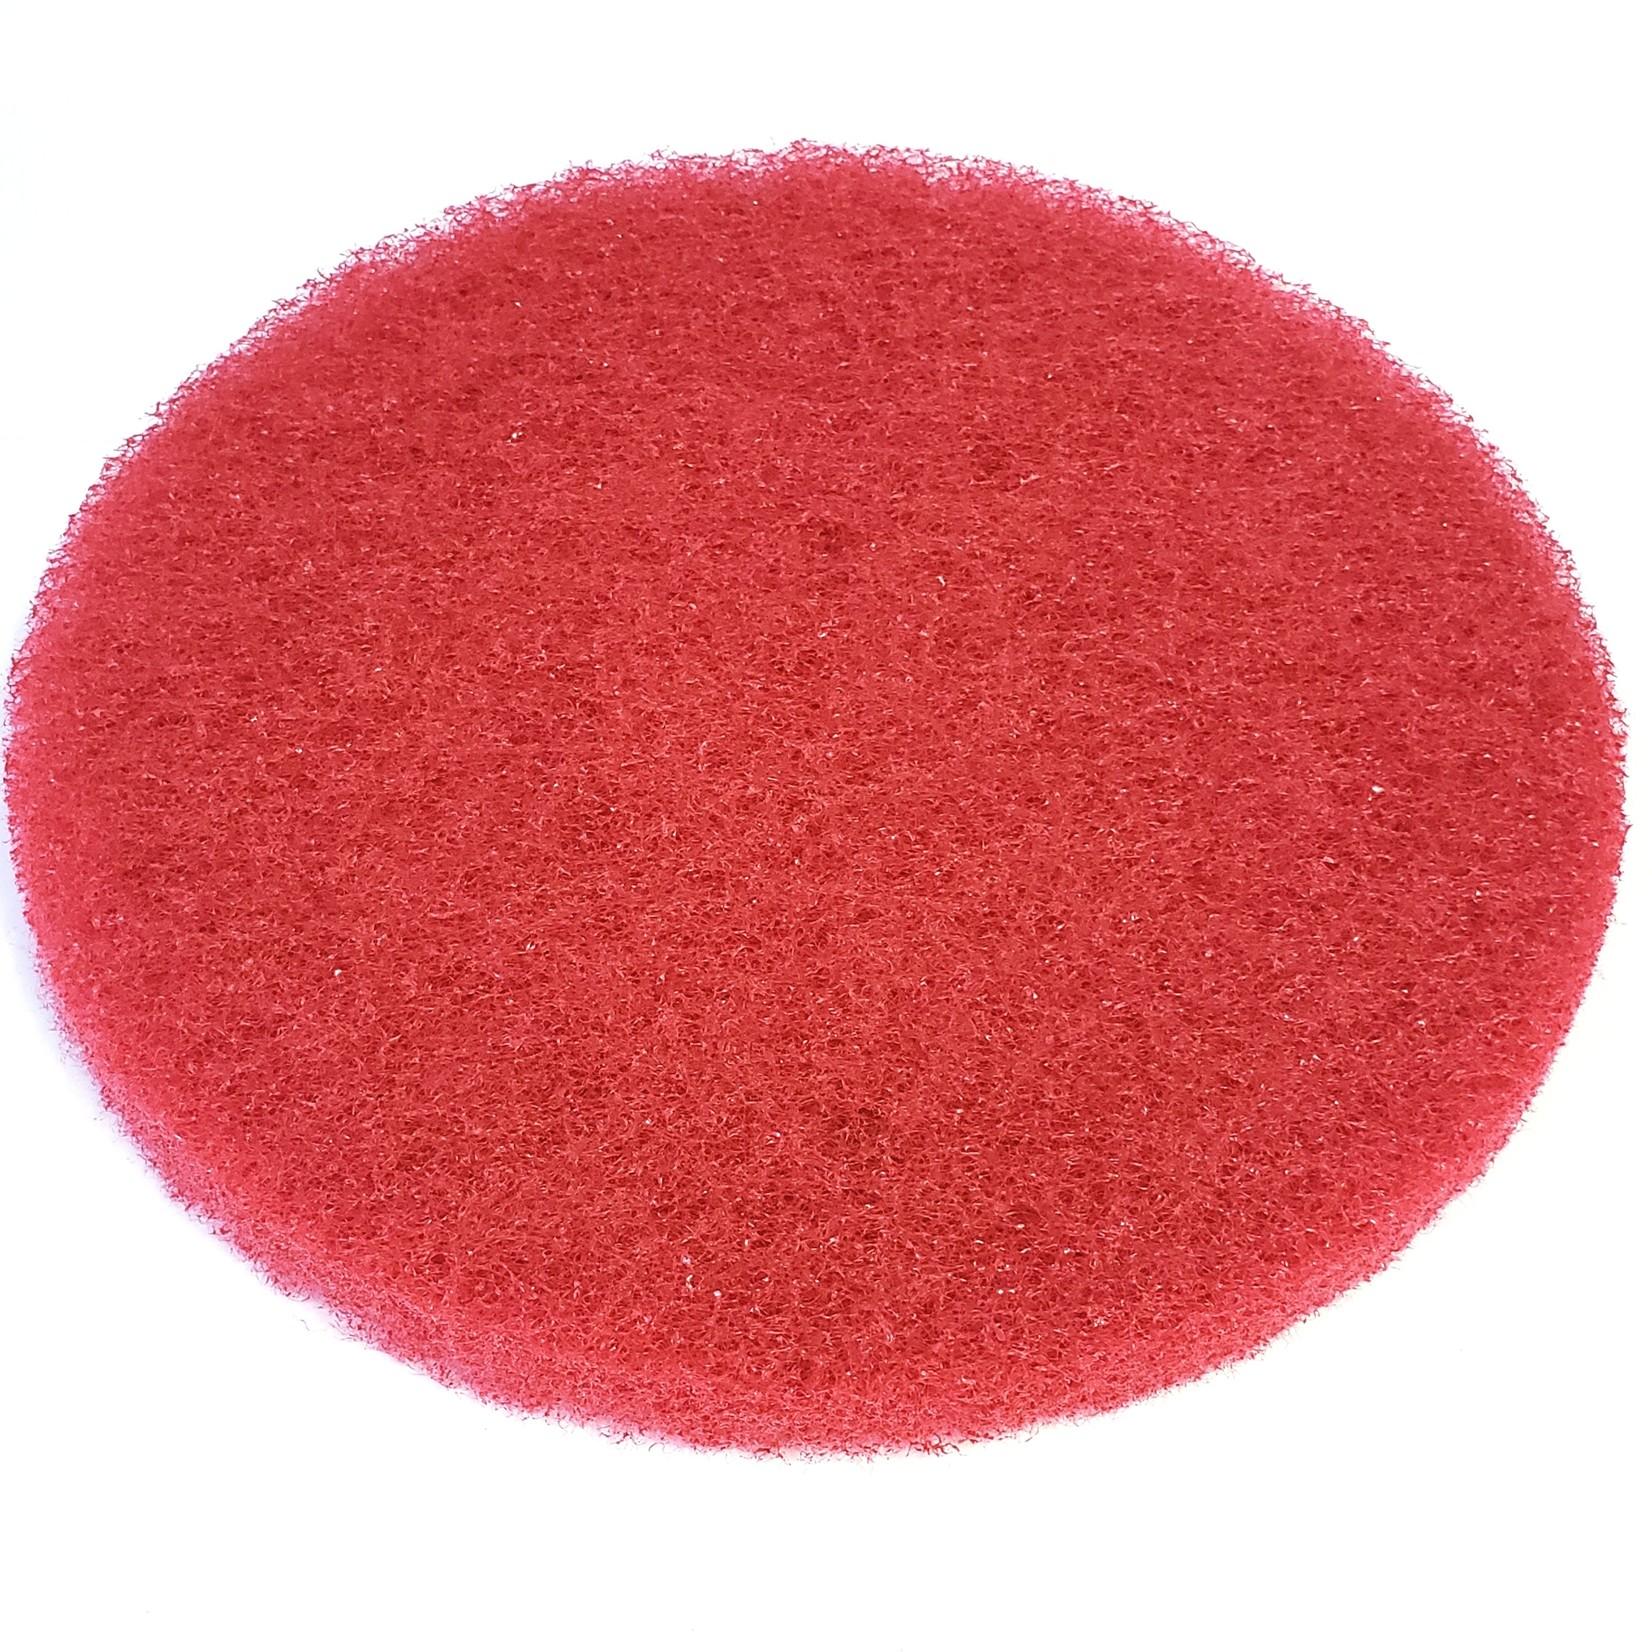 "Tampon à polir 12"" rouge"